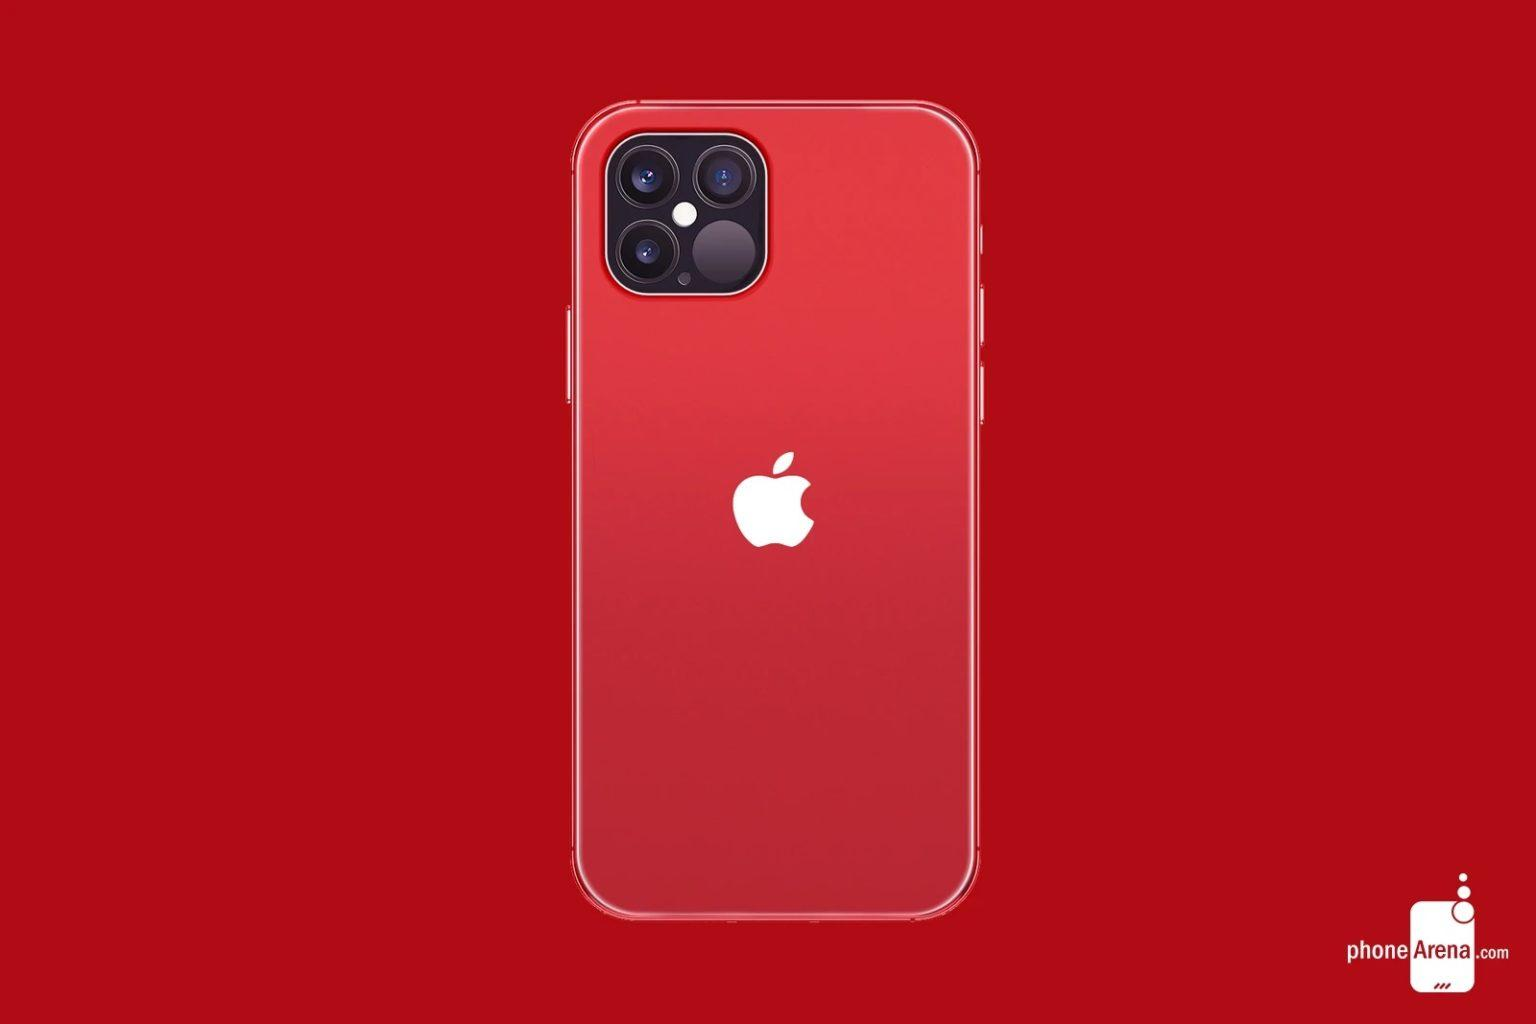 iPhone 12 rojo 1536x1024 1